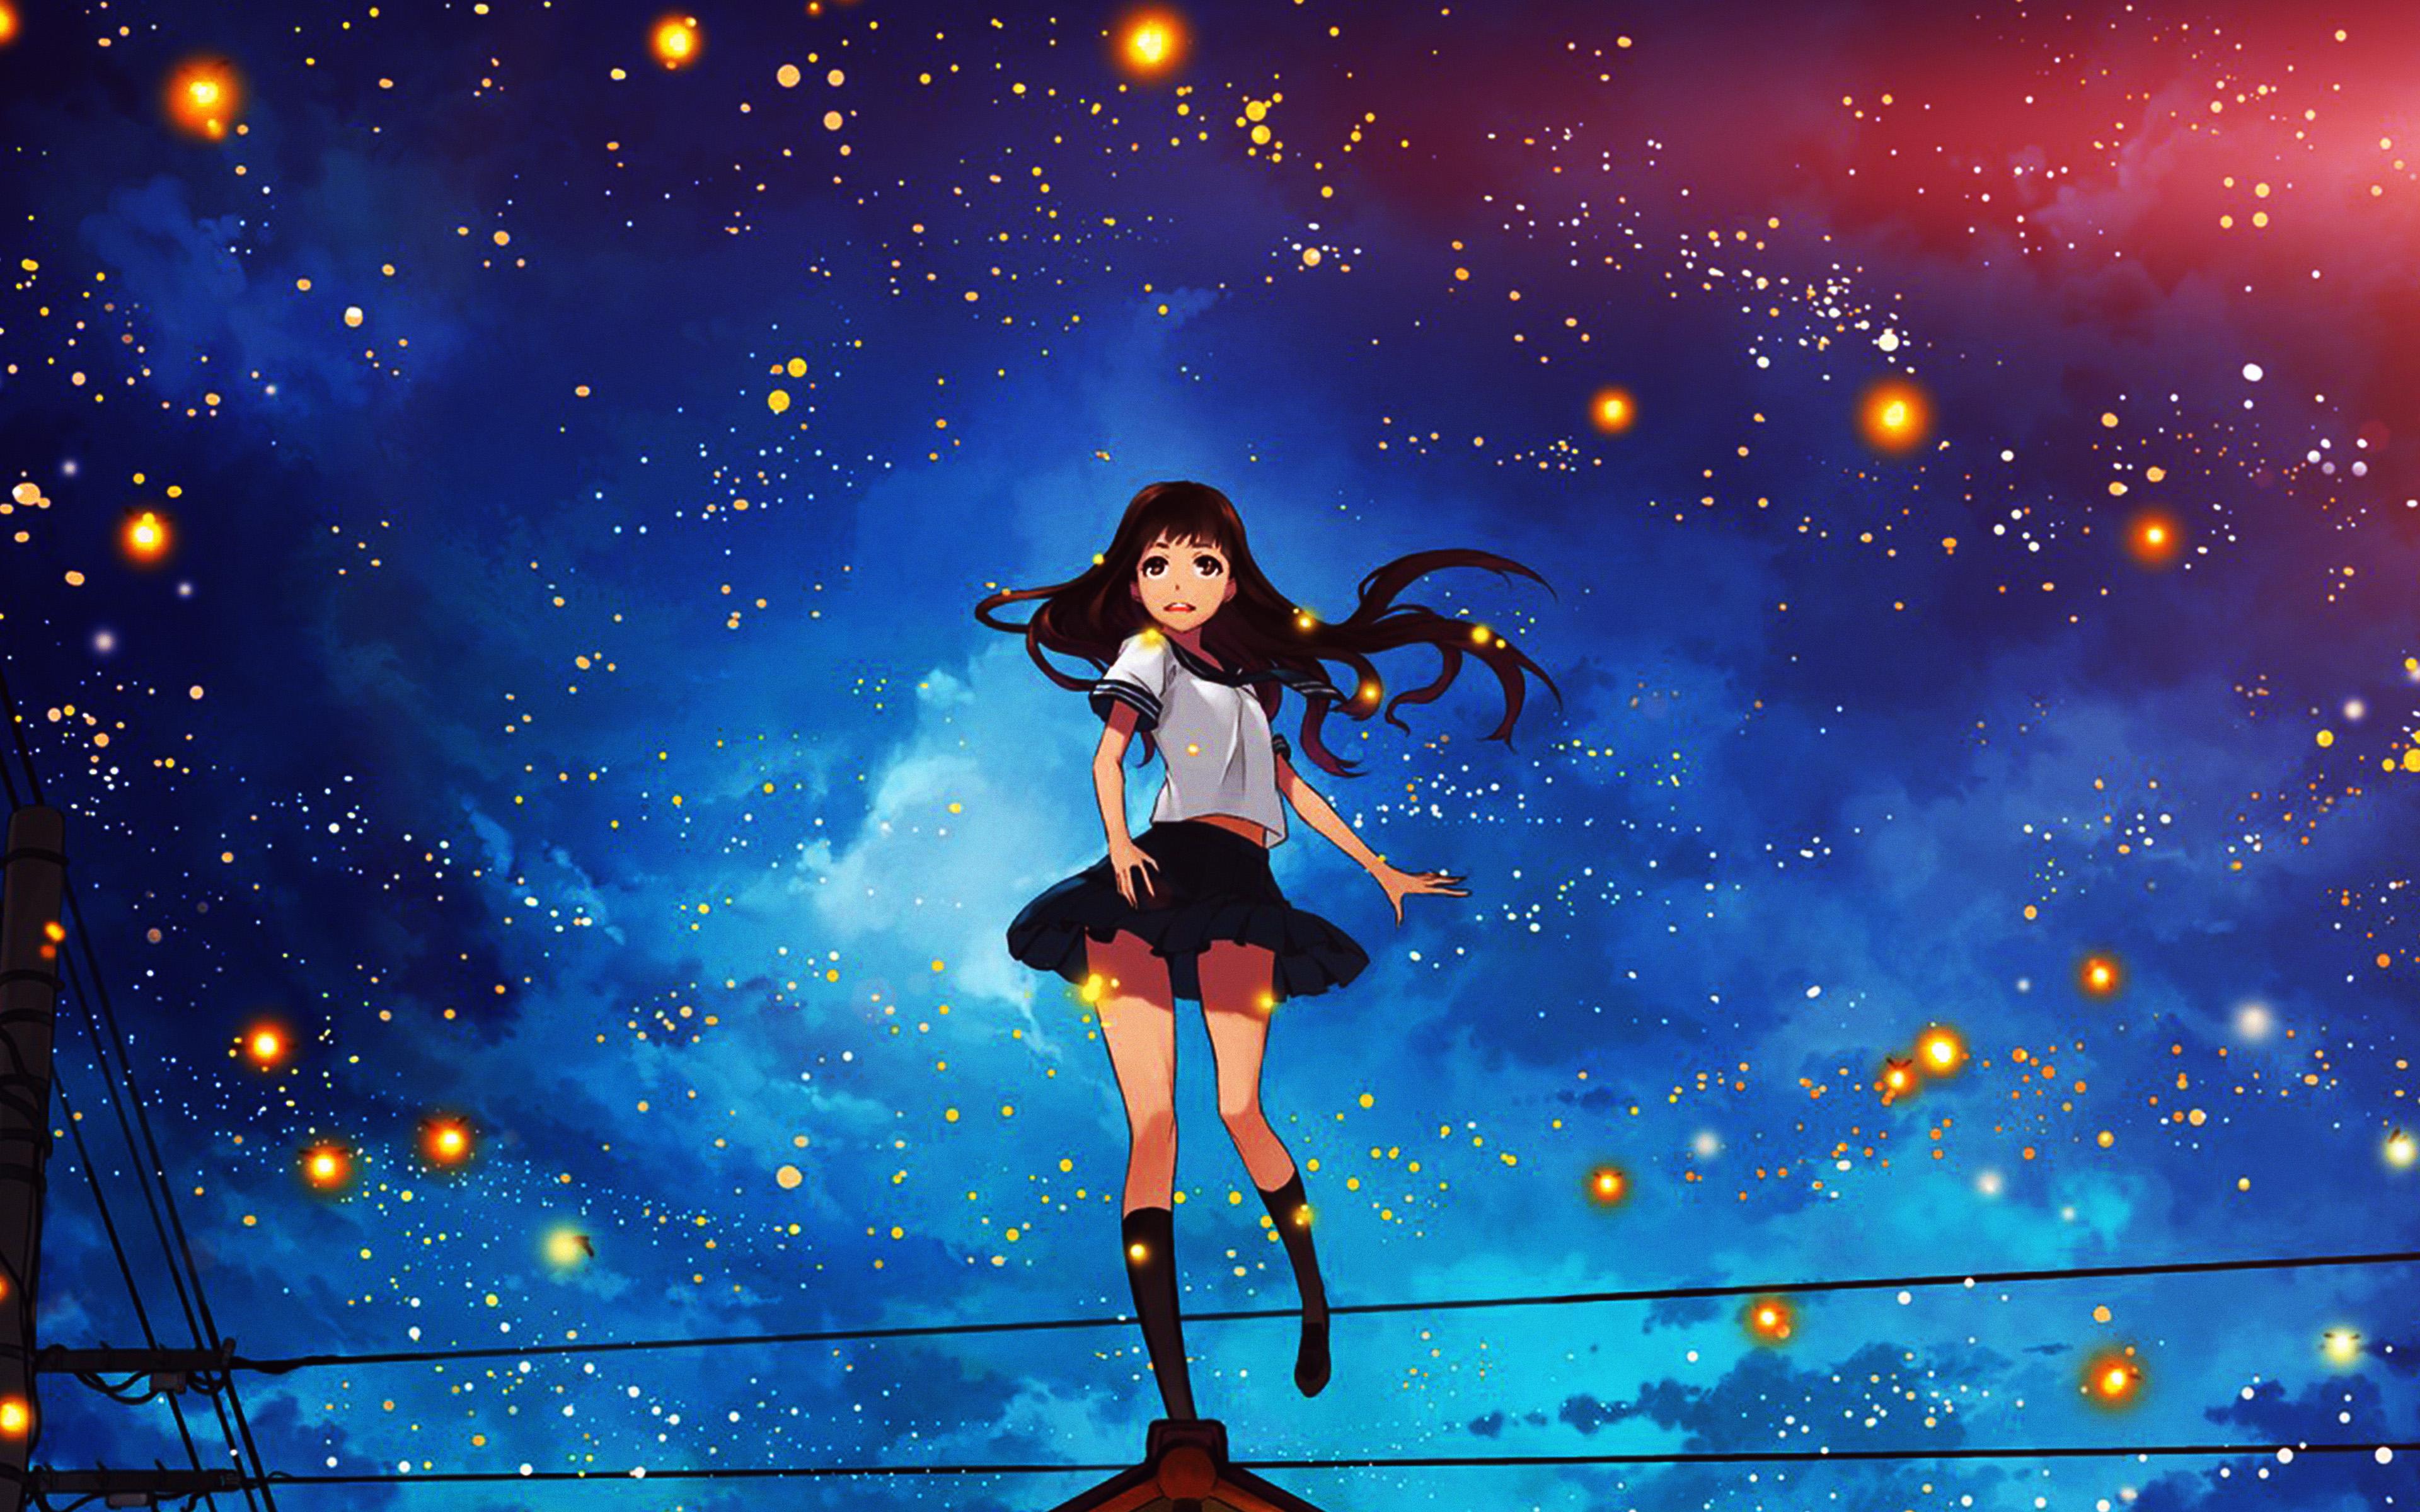 au47-girl-anime-star-space-night-illustration-art-flare-wallpaper